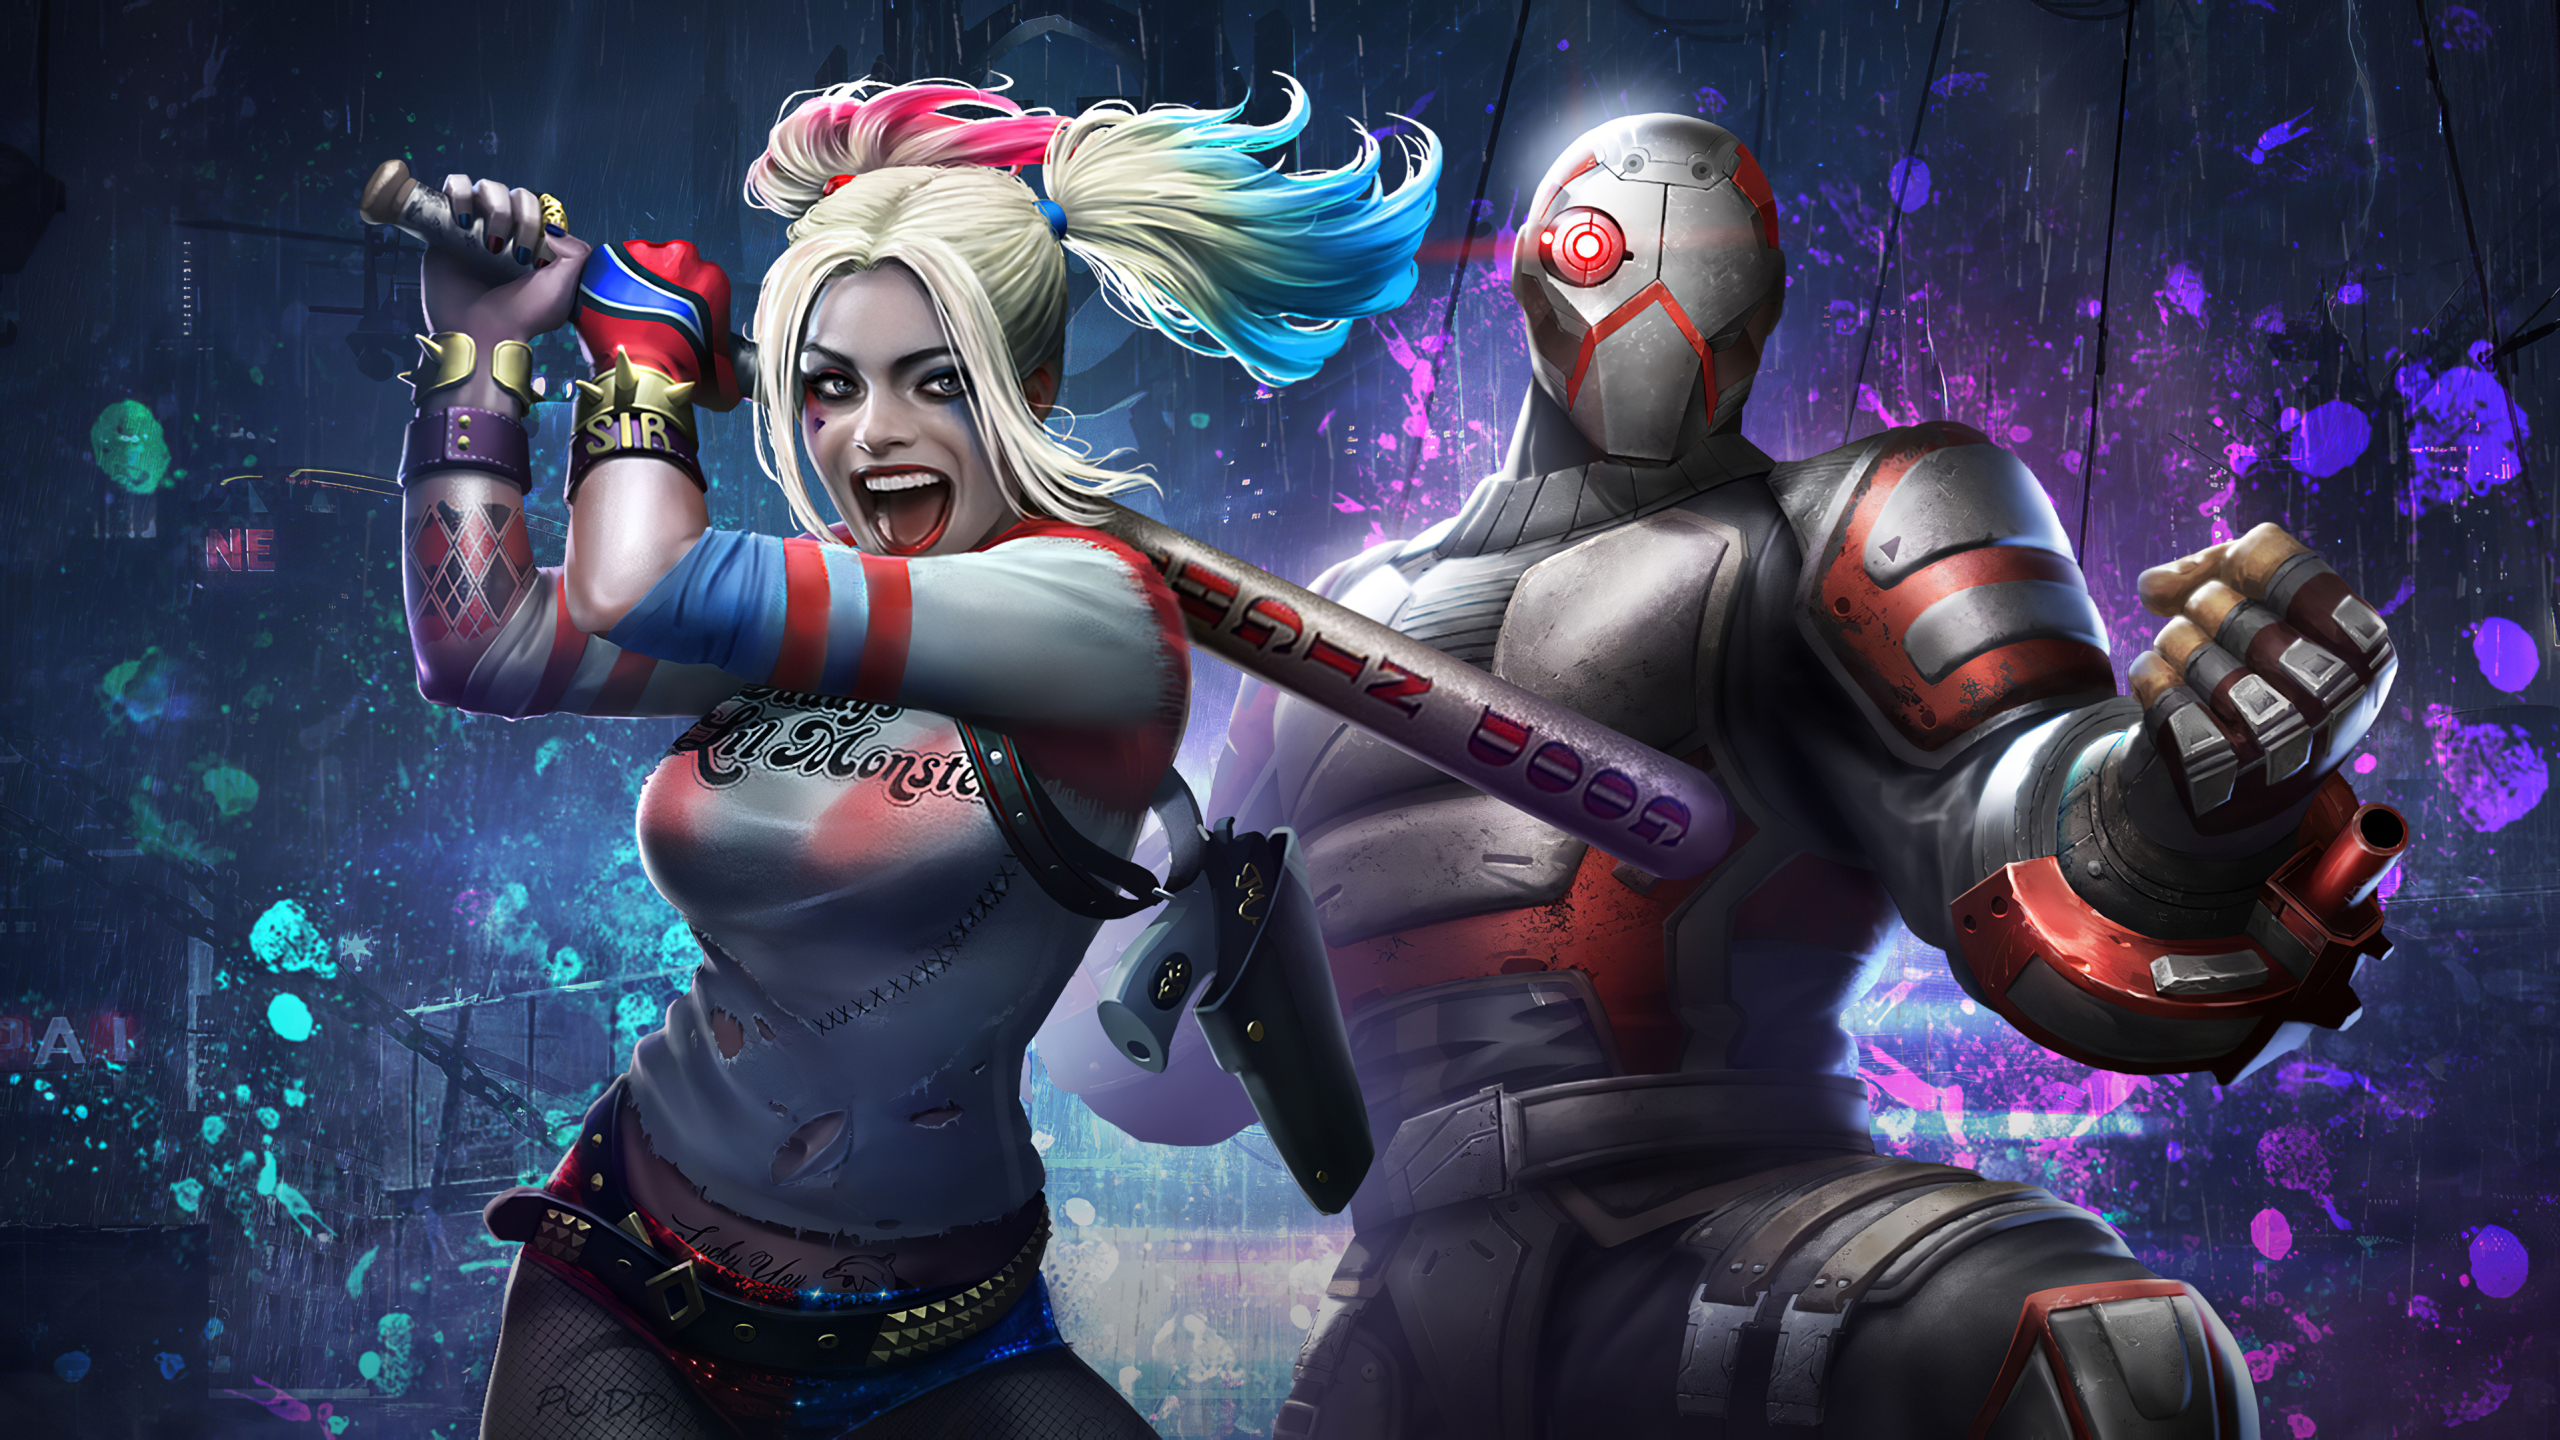 2560x1440 Harley Quinn & Deadshot Injustice 2 Mobile 1440P ...